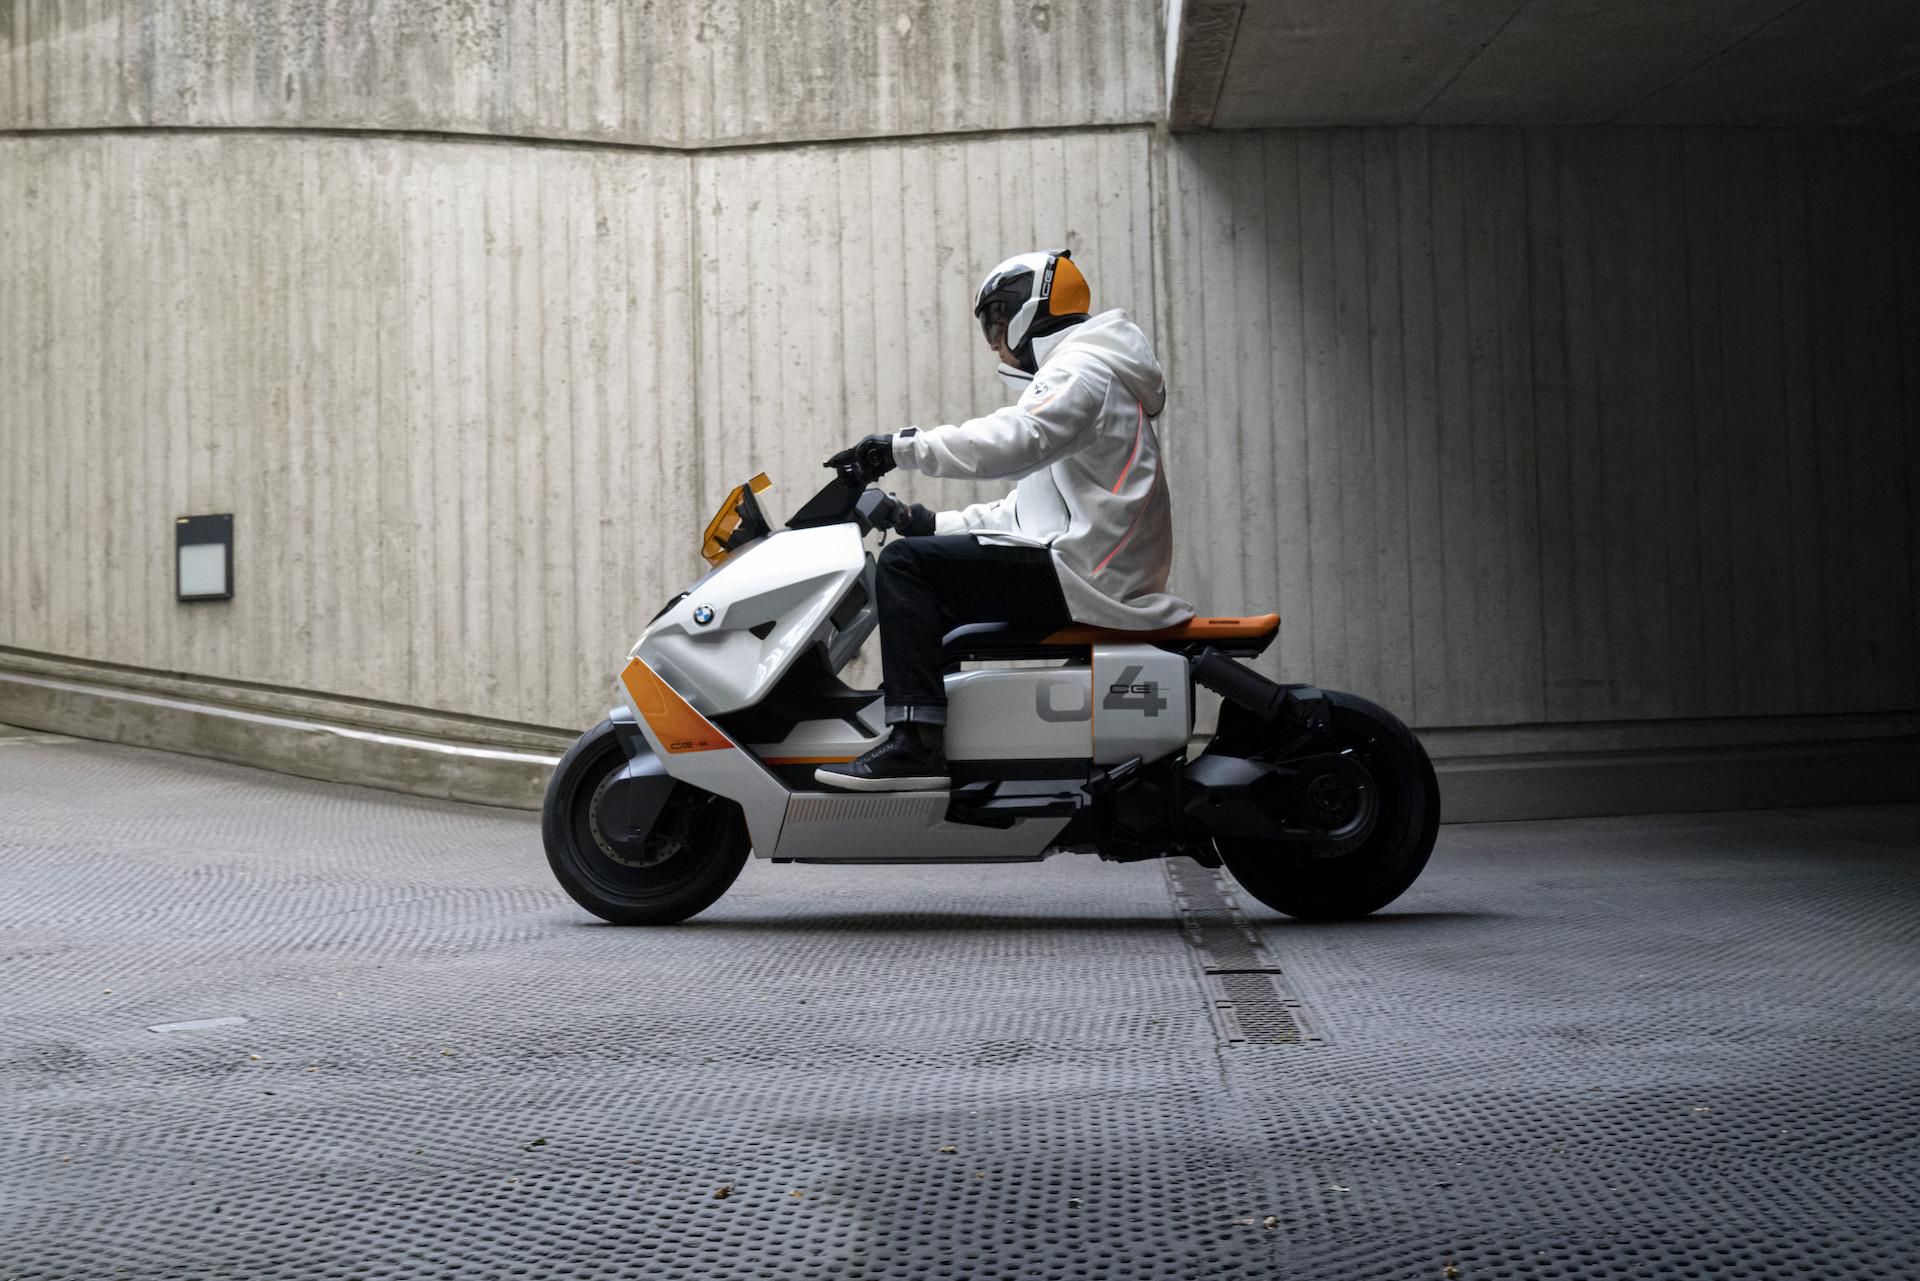 Moto Bmw Definition Accion5